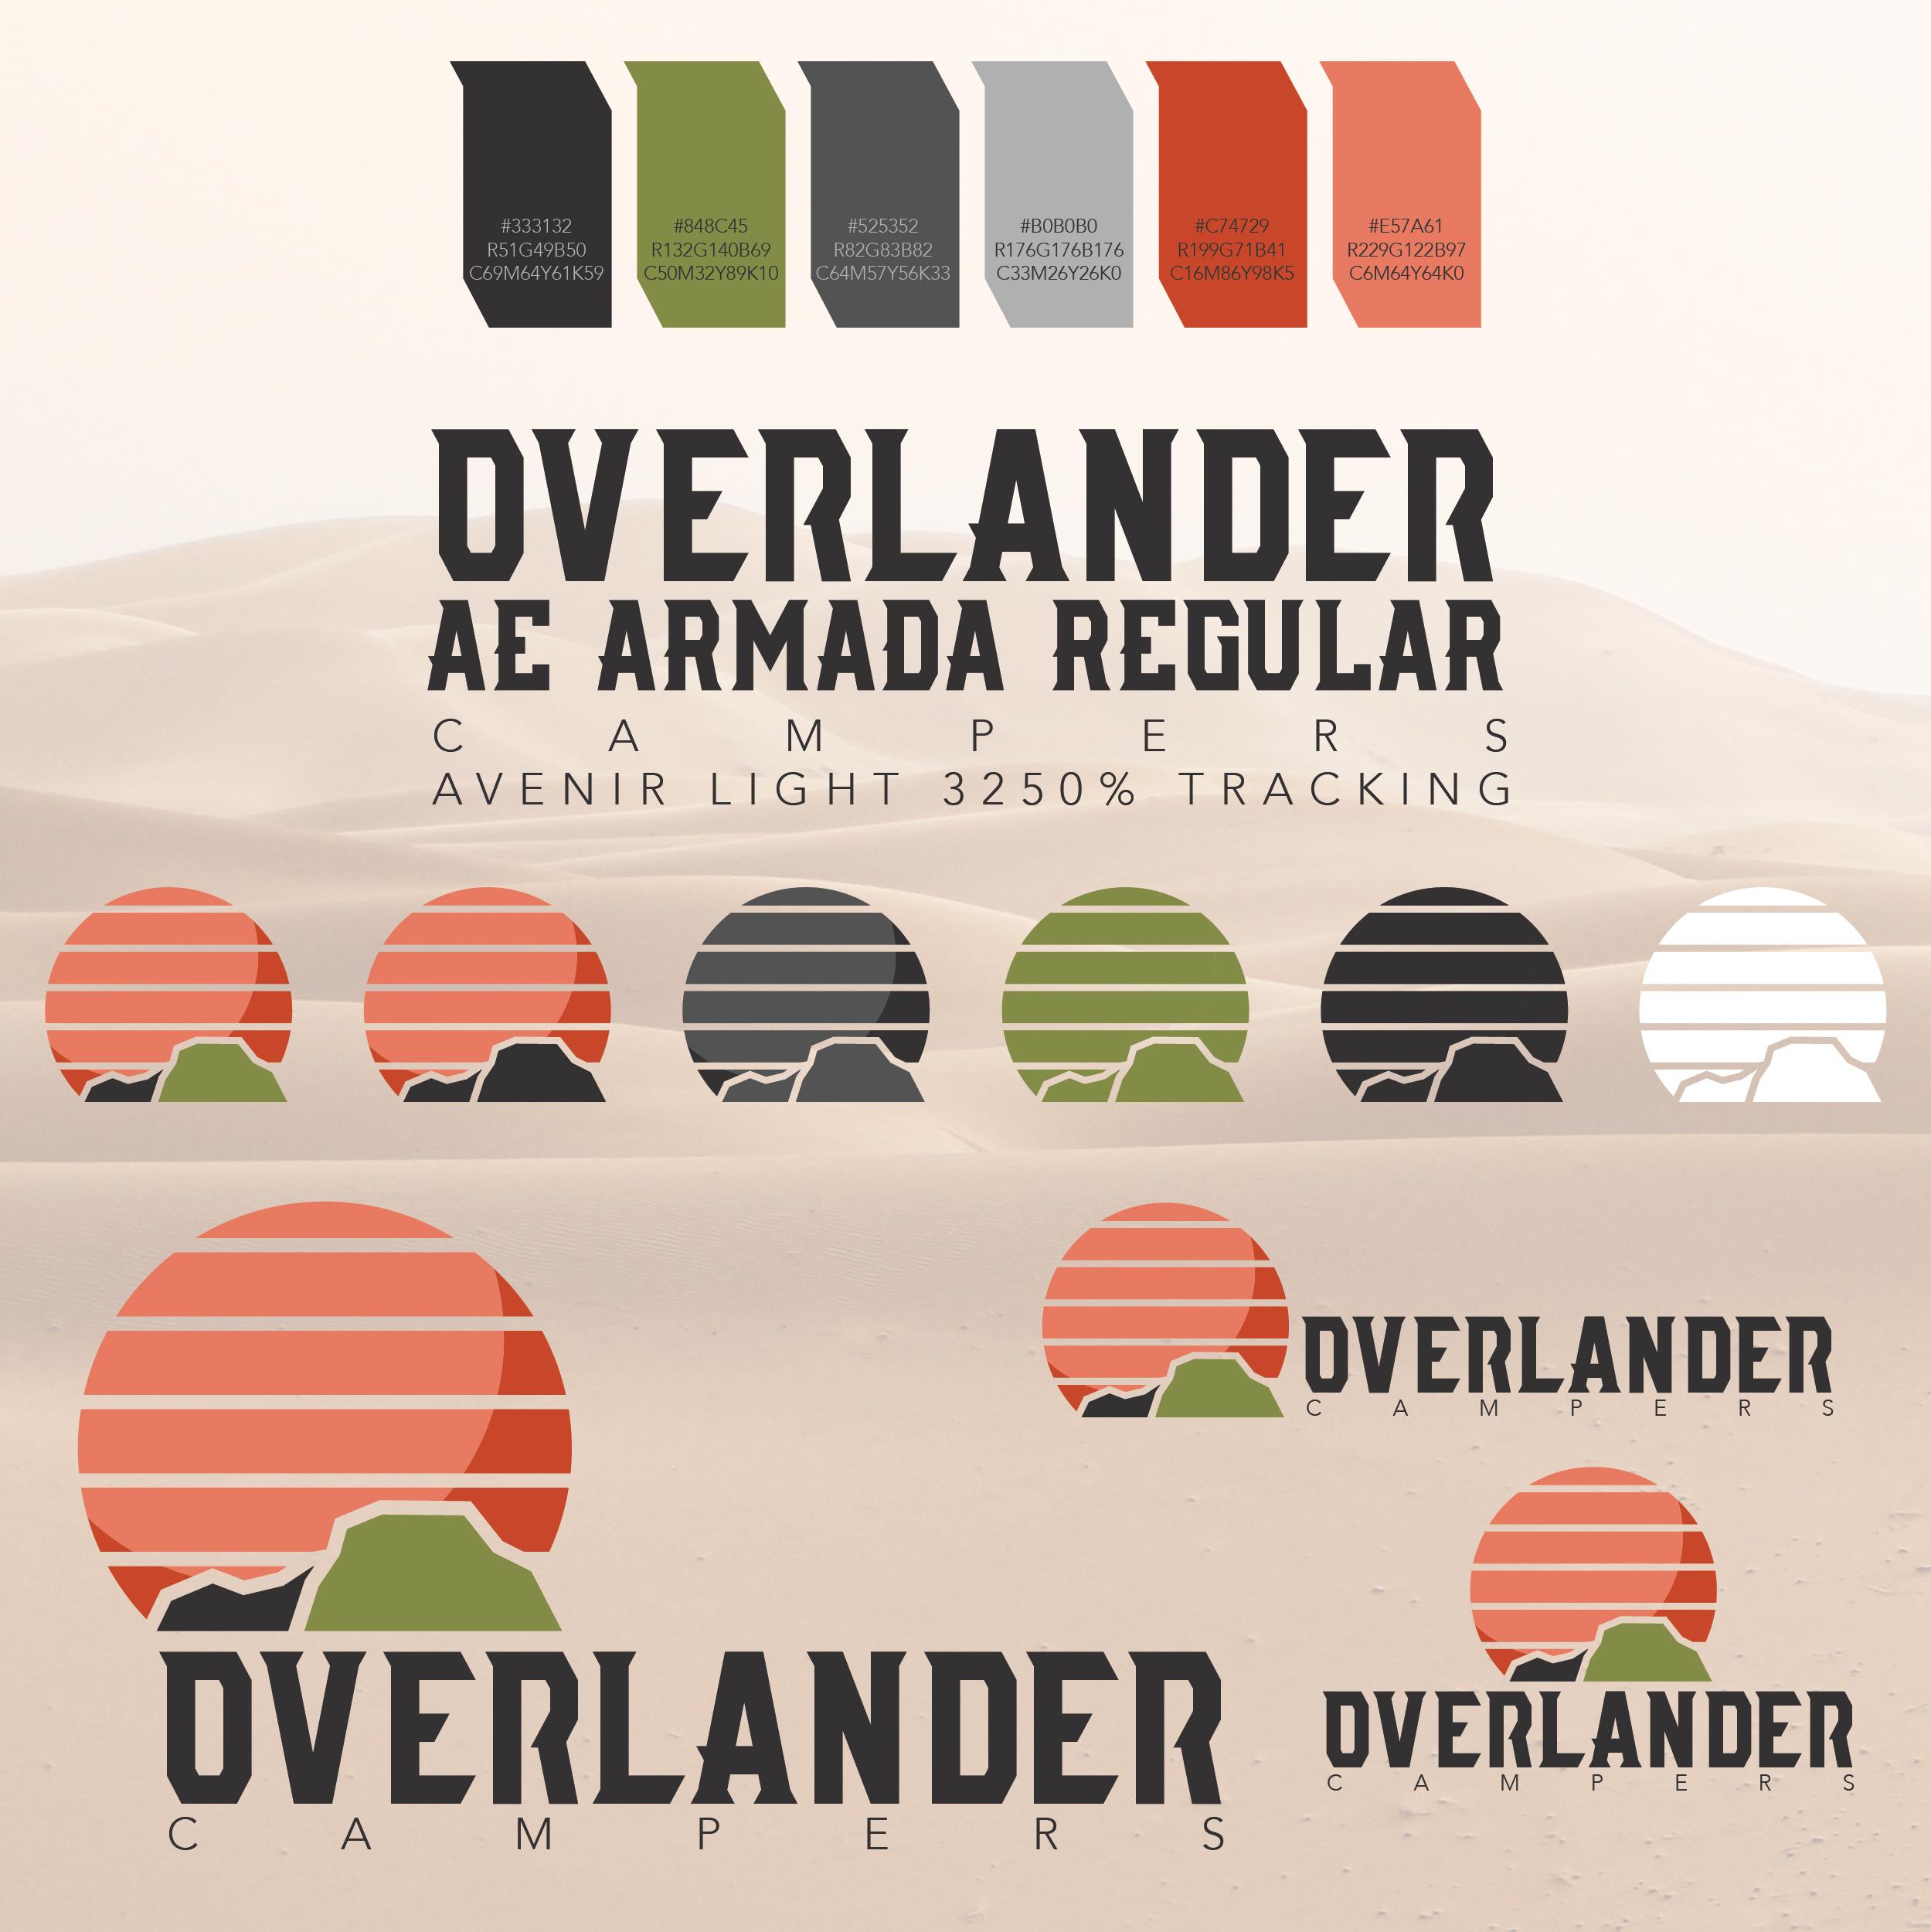 Overlander Campers Brand Development Logo Examples